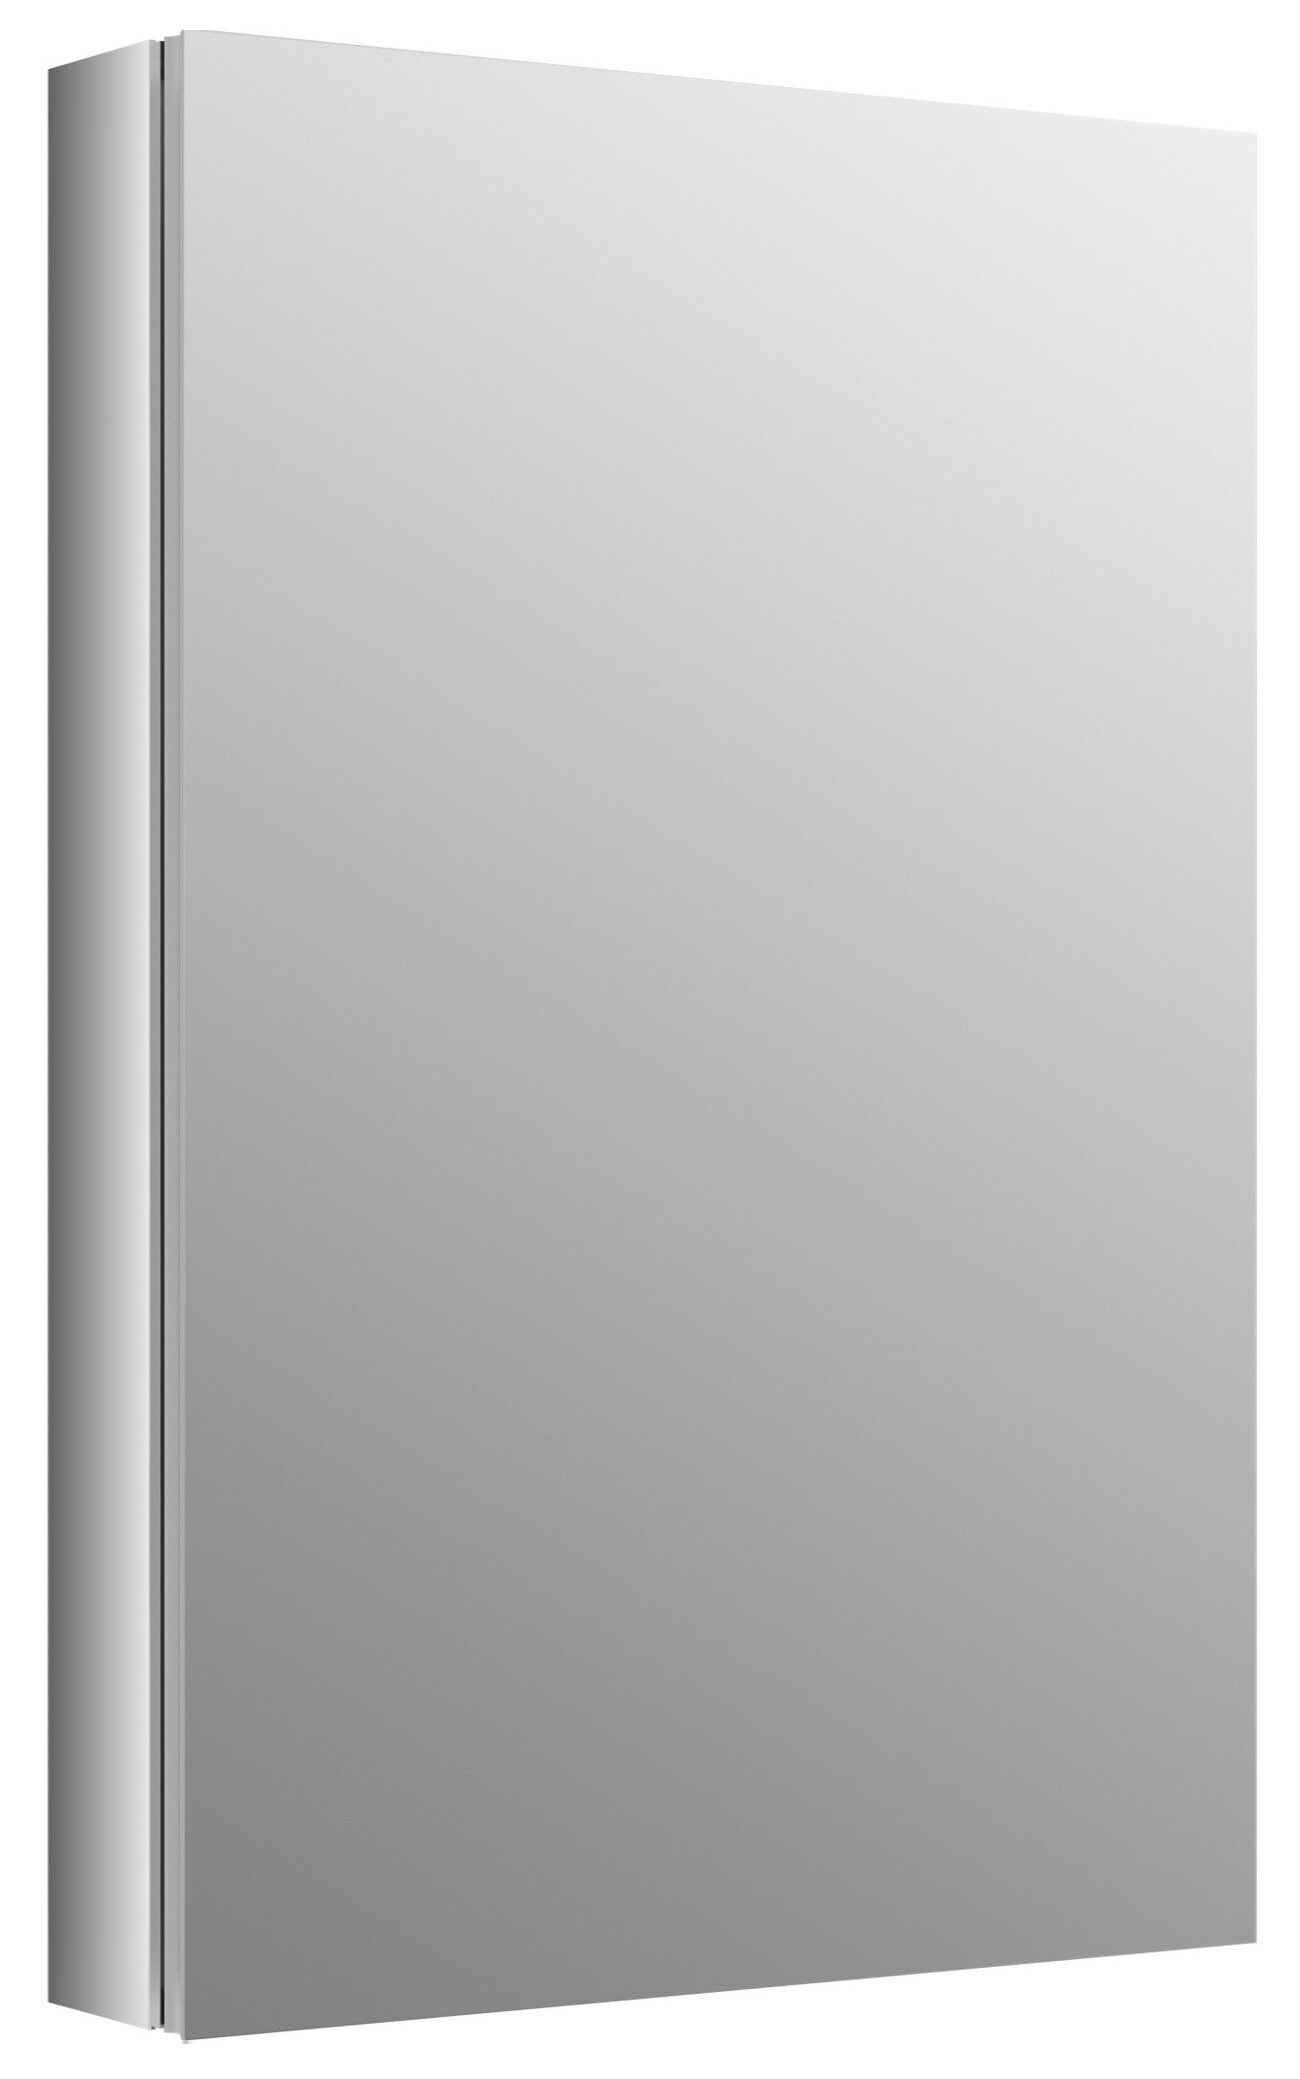 Beau Verdera Aluminum Medicine Cabinet